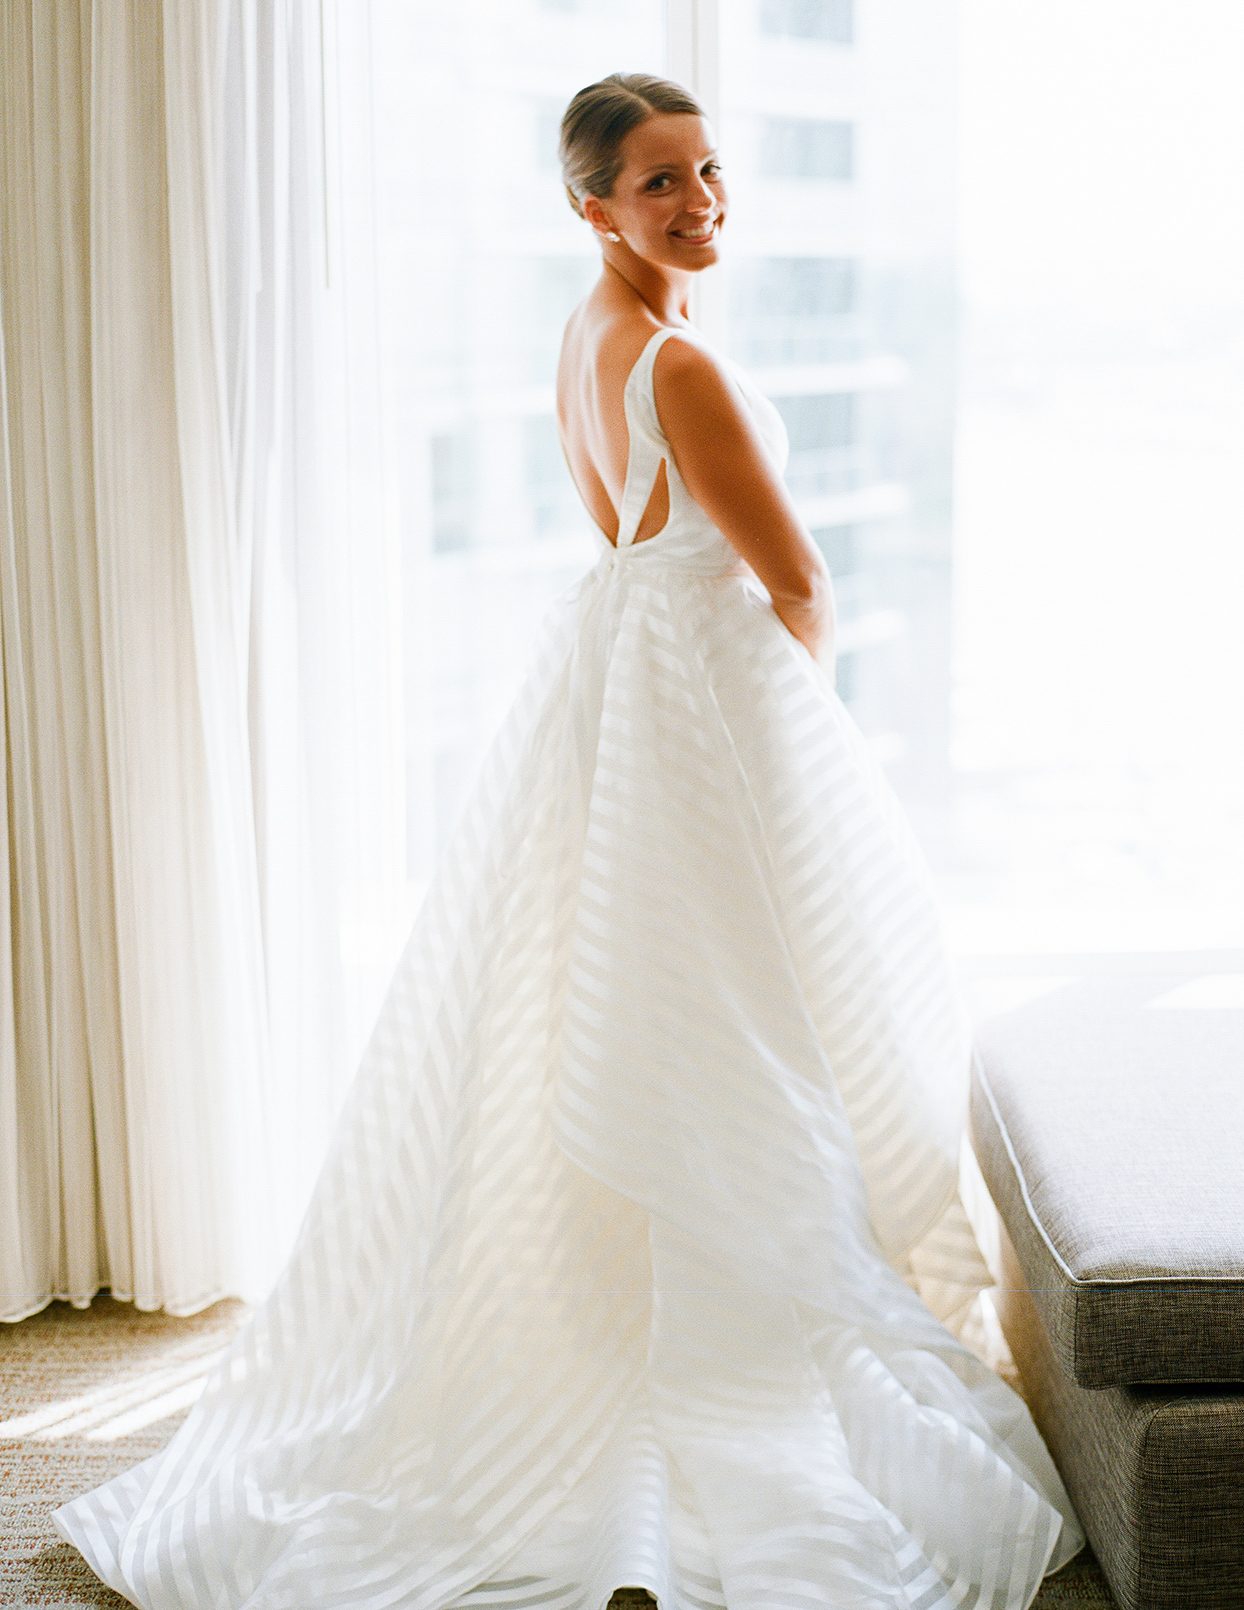 shelby david wedding bride in front of window